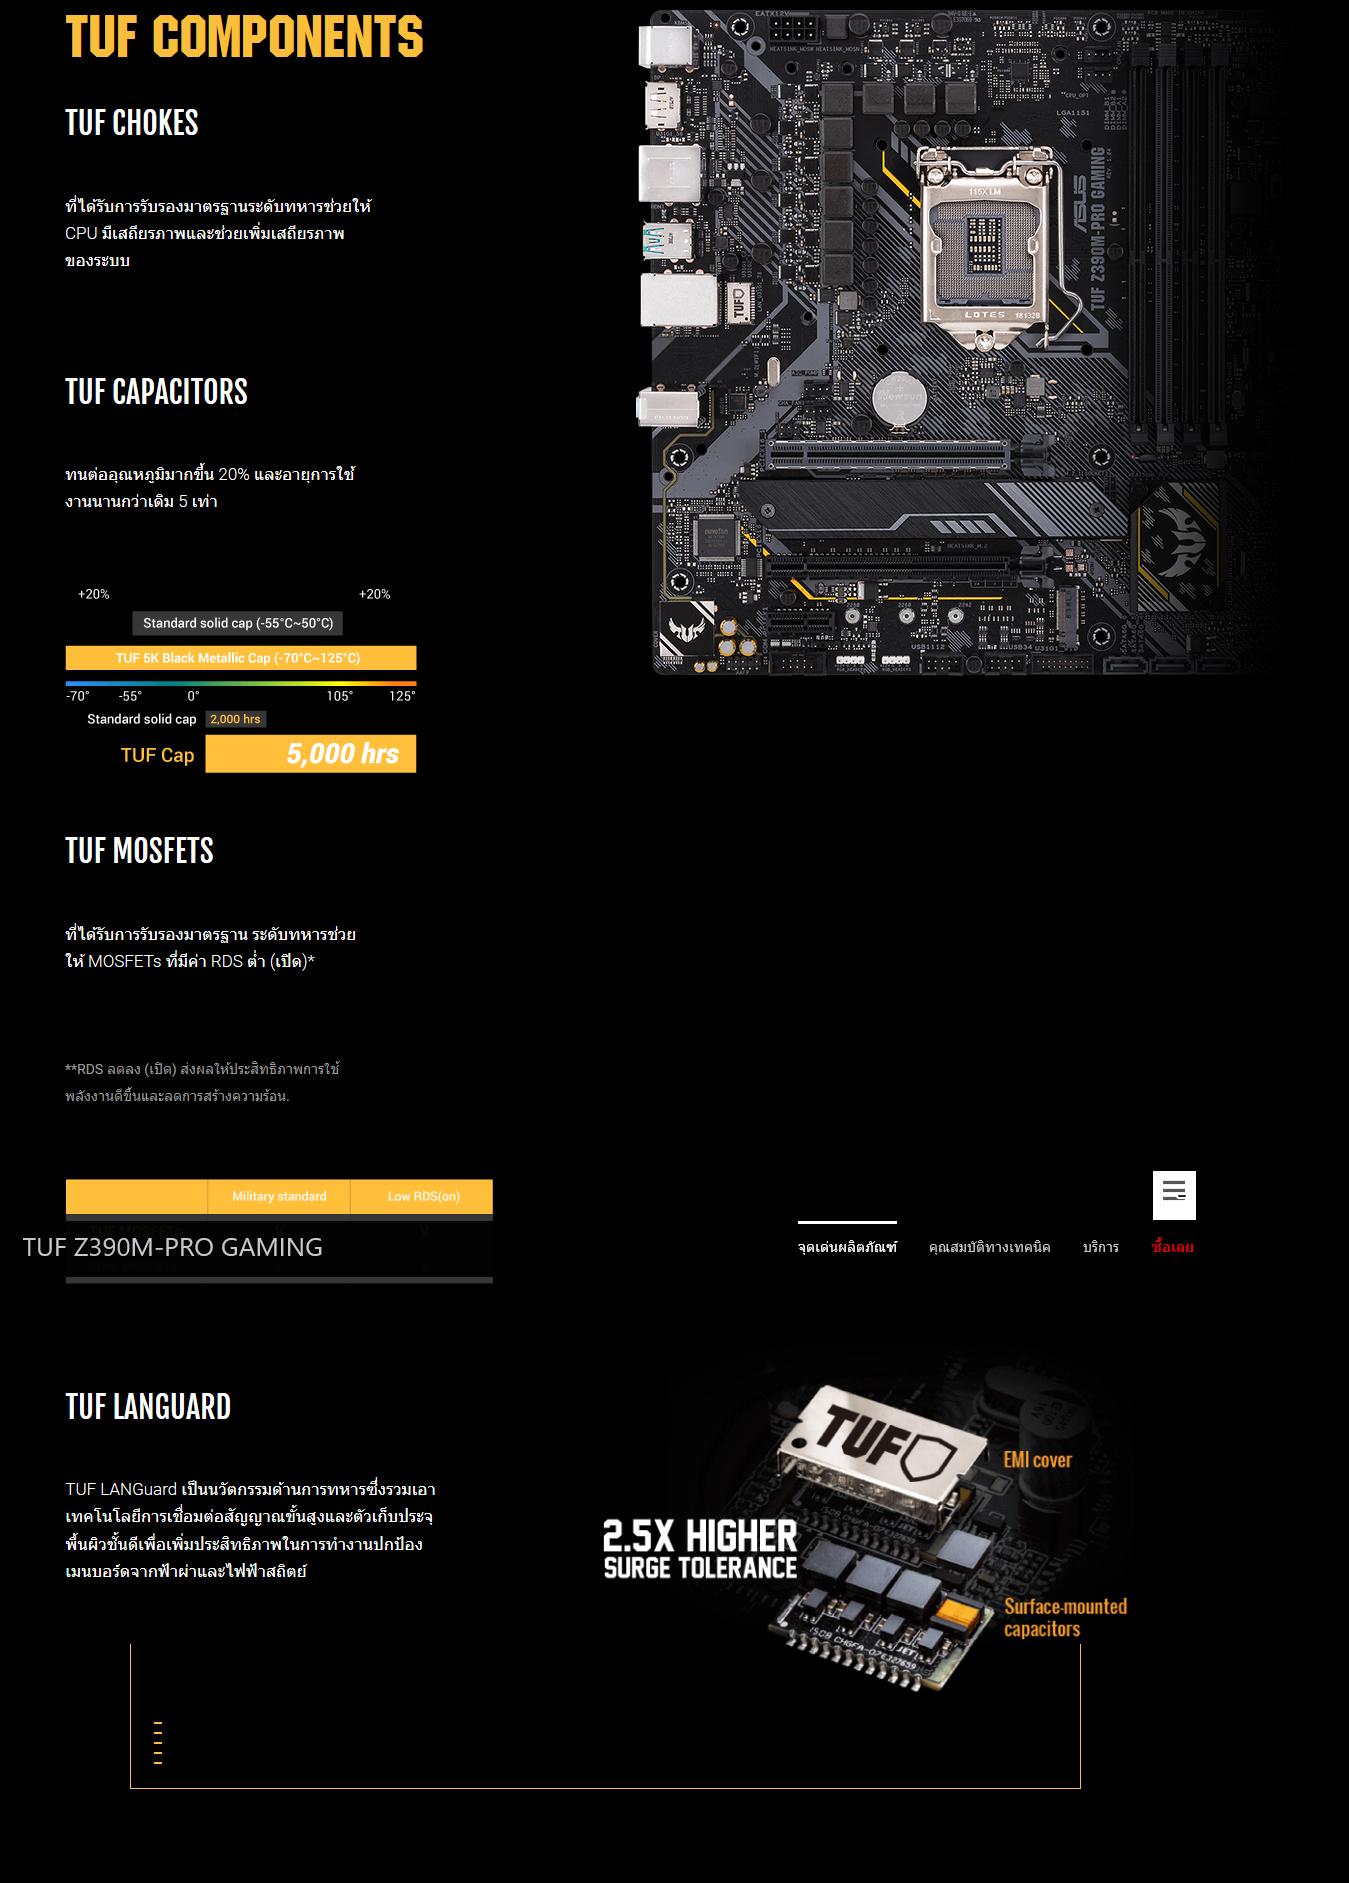 screenshot 2019 01 02 tuf z390m pro gaming e0b980e0b8a1e0b899e0b89ae0b8ade0b8a3e0b98ce0b894 asus e0b89be0b8a3e0b8b0e0b980e0b897e0b8a8e0b984e0b897 ASUS TUF Z390M PRO GAMING REVIEW